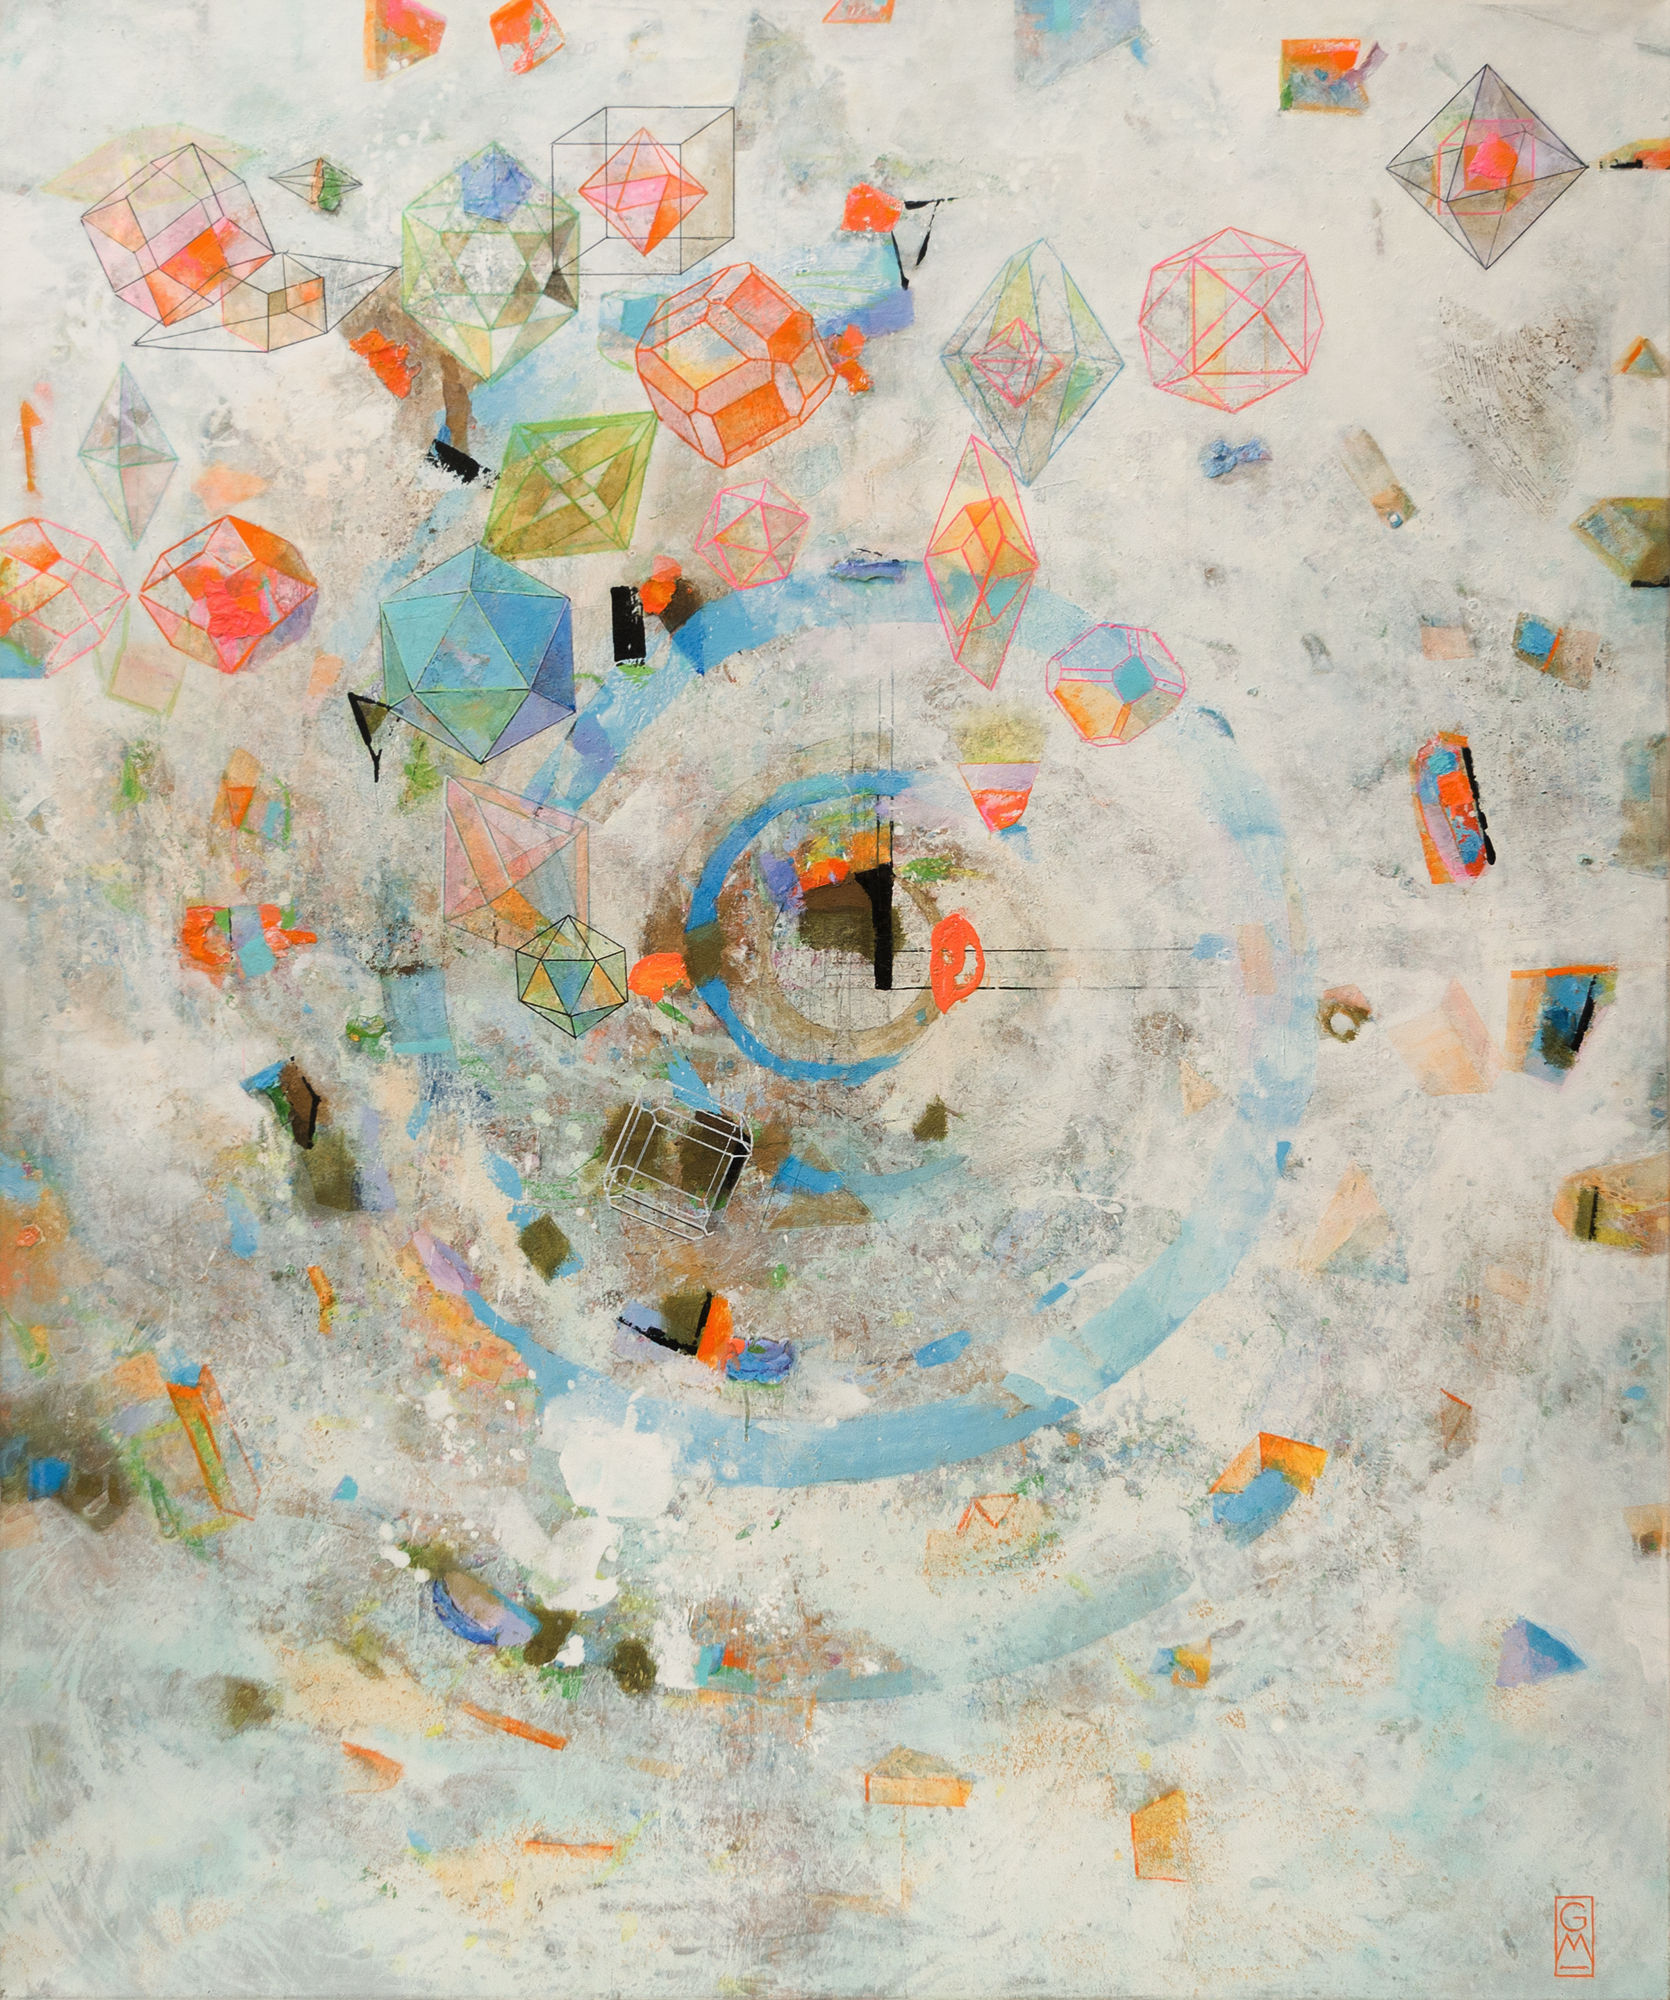 Kristallines | 2011 | 180 x 150 cm | Gerlinde Mader